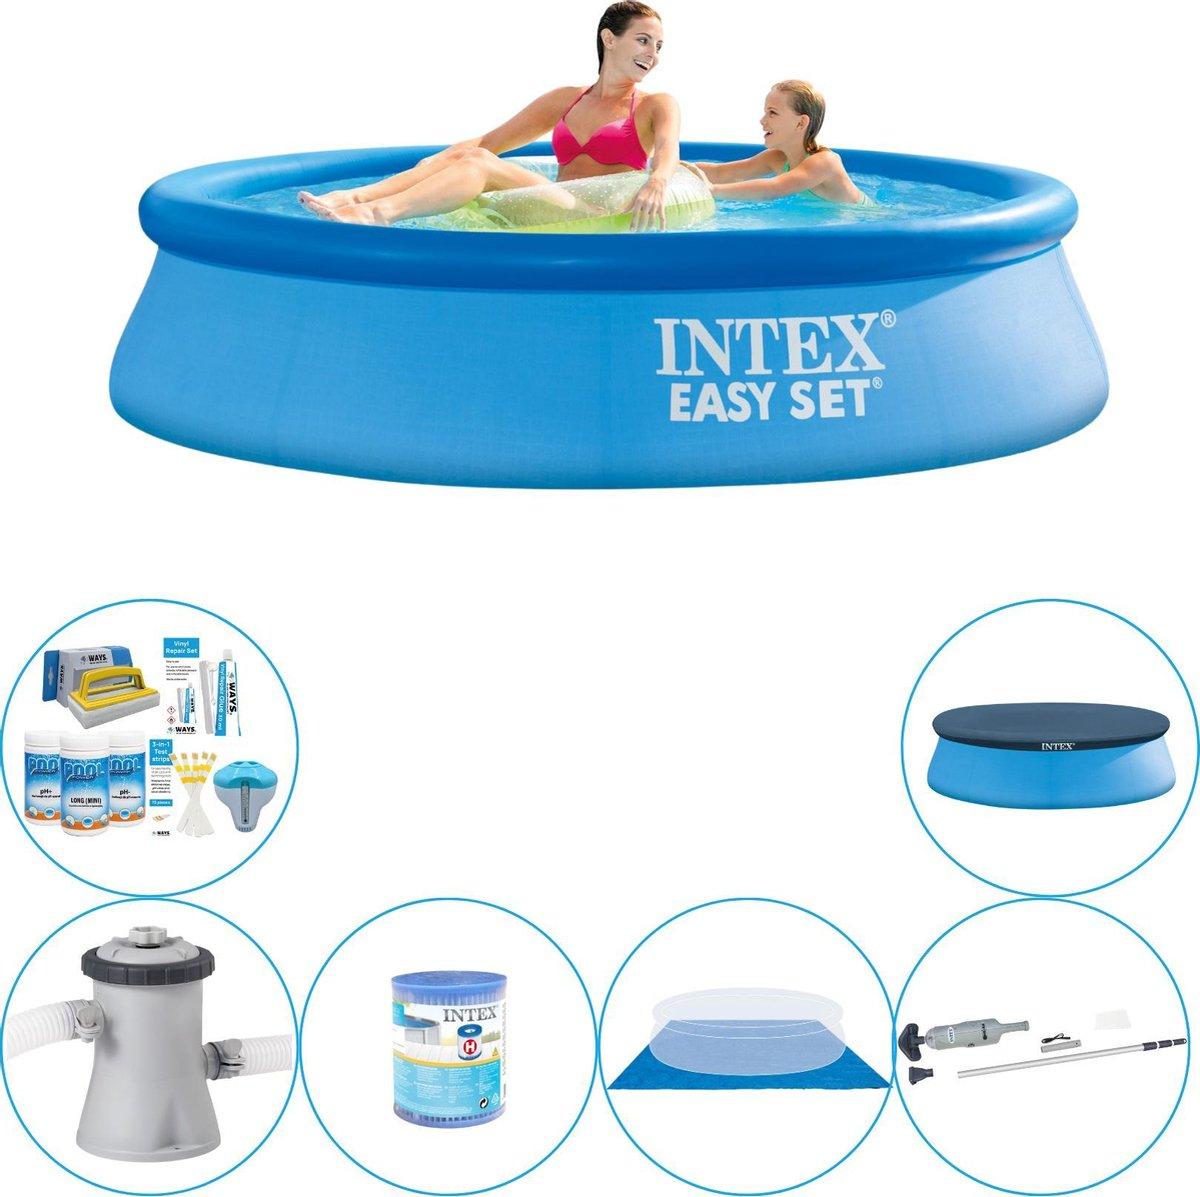 Intex Easy Set Rond 244x61 cm - Zwembad Inclusief Accessoires